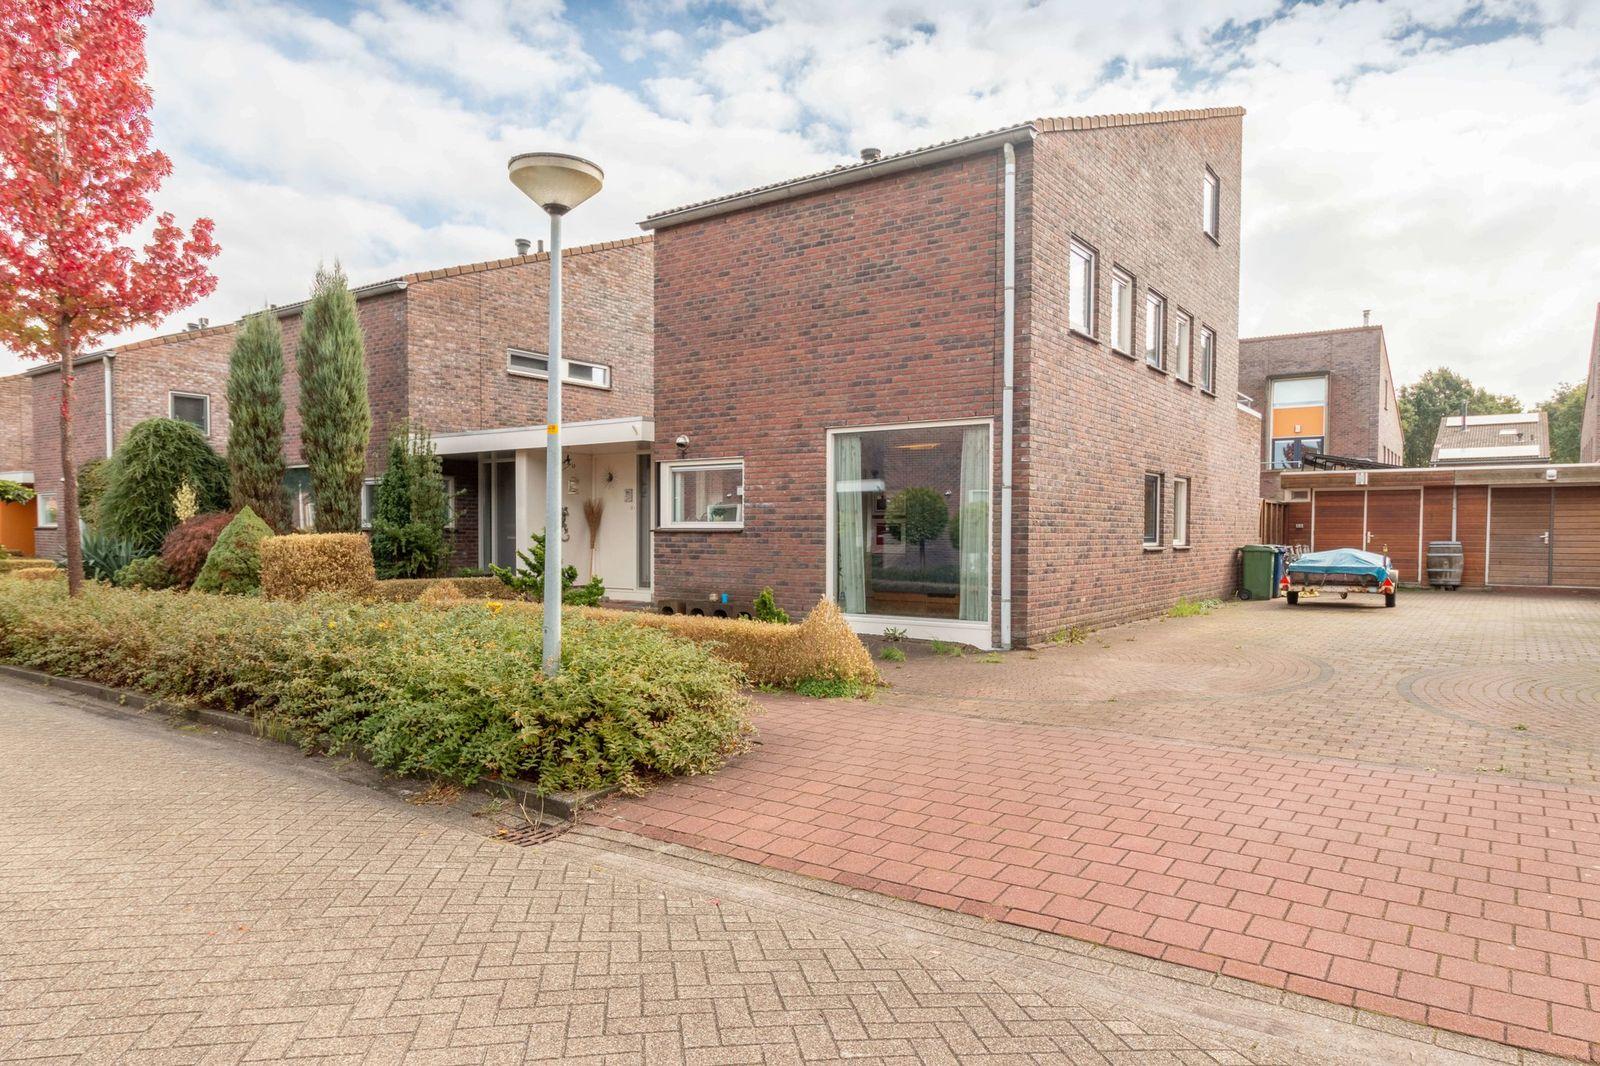 Zondaghof 21, Almere